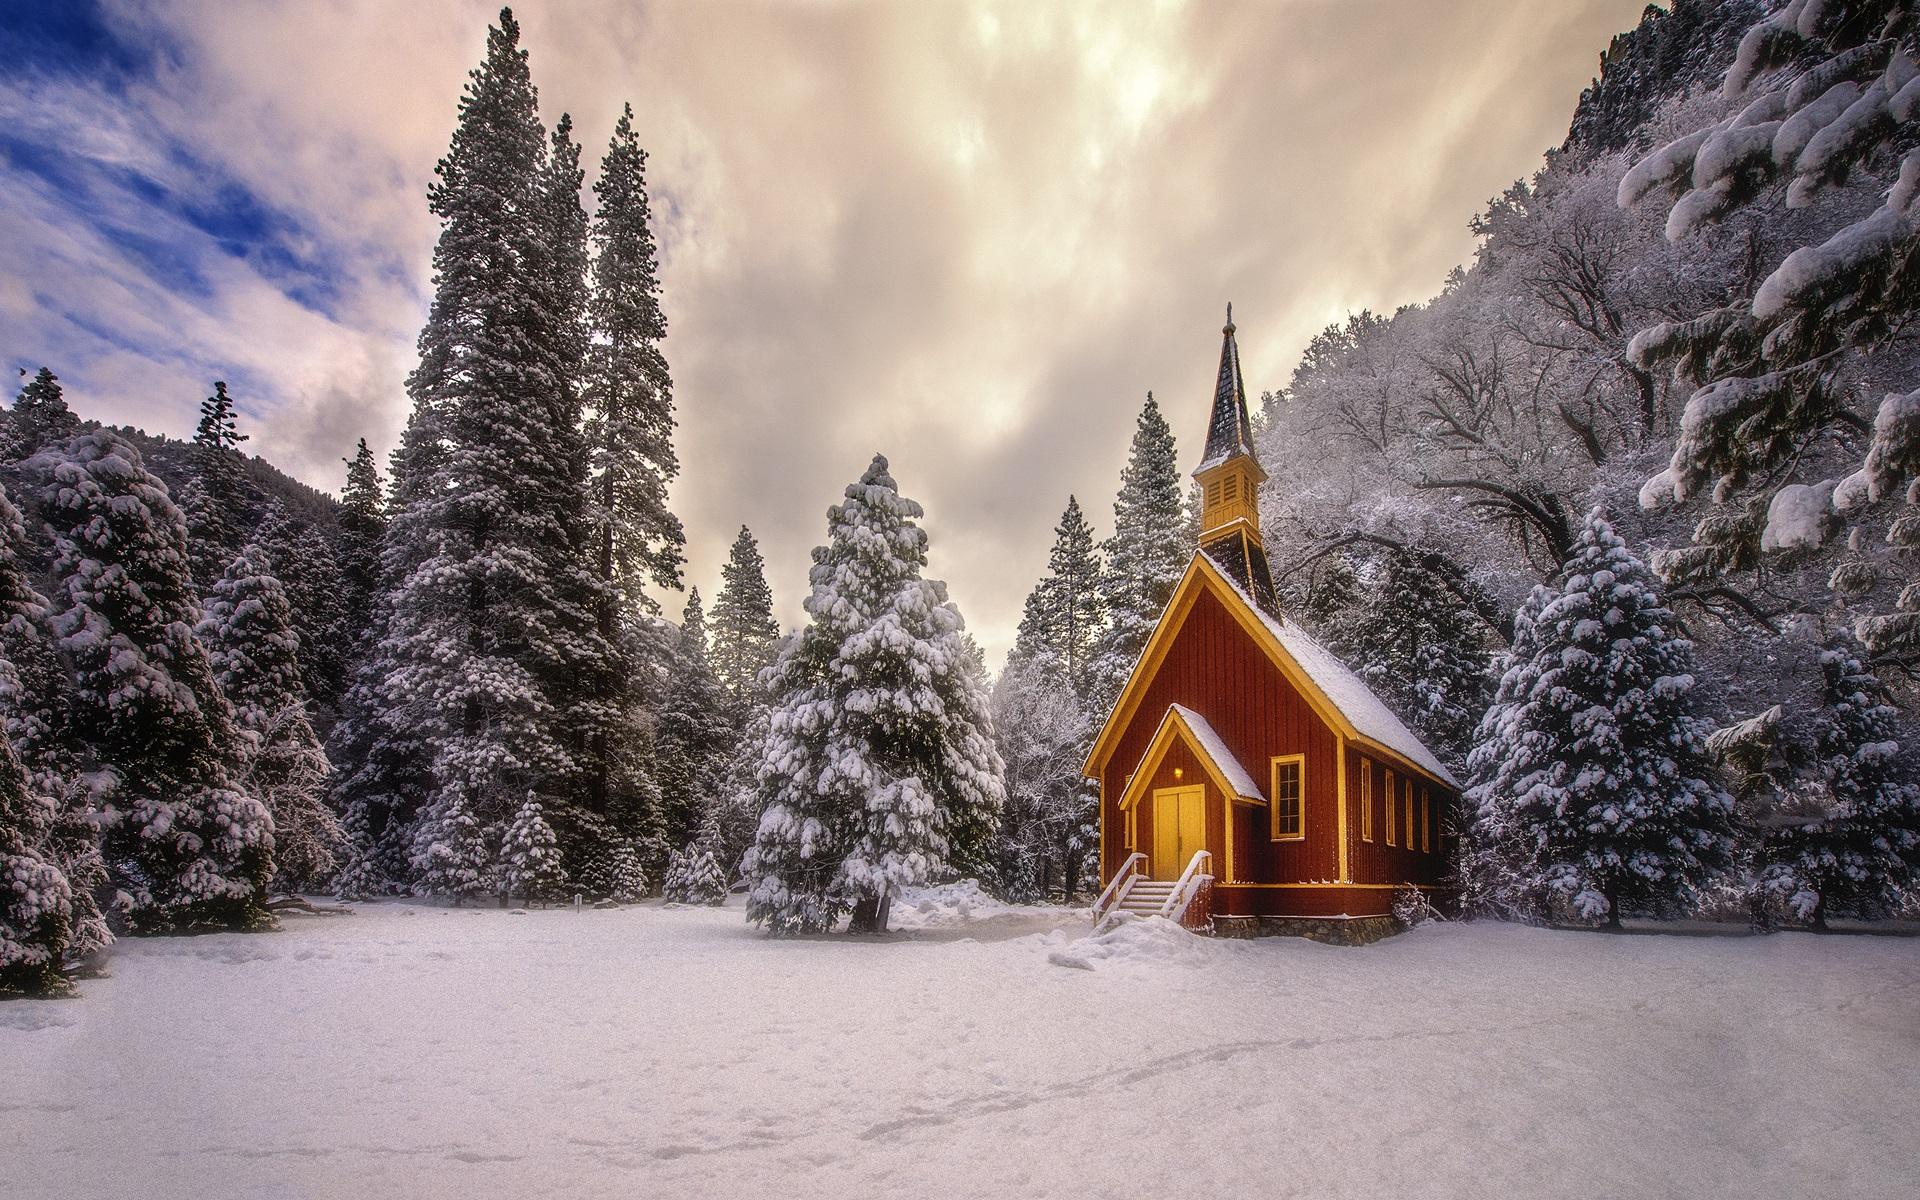 Wallpapers Montañas Nevadas: Fondos De Pantalla Invierno, árboles, Montañas, Nieve